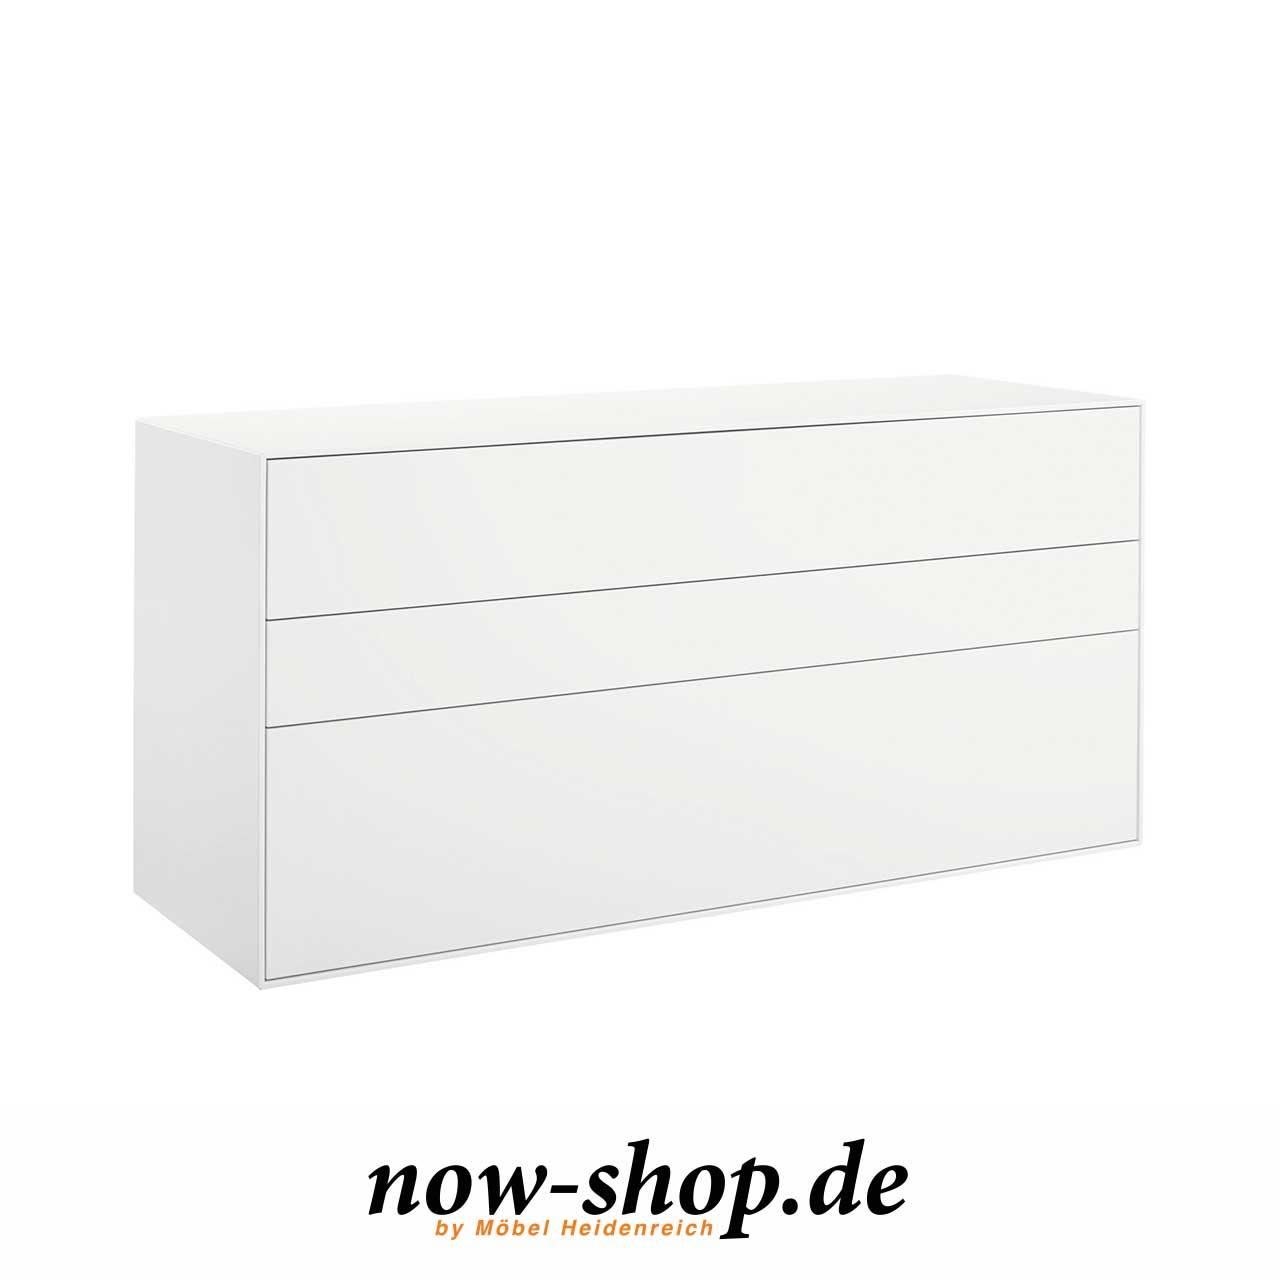 Now By Hülsta Möbel Kaufen Easy Sideboard Now Shop